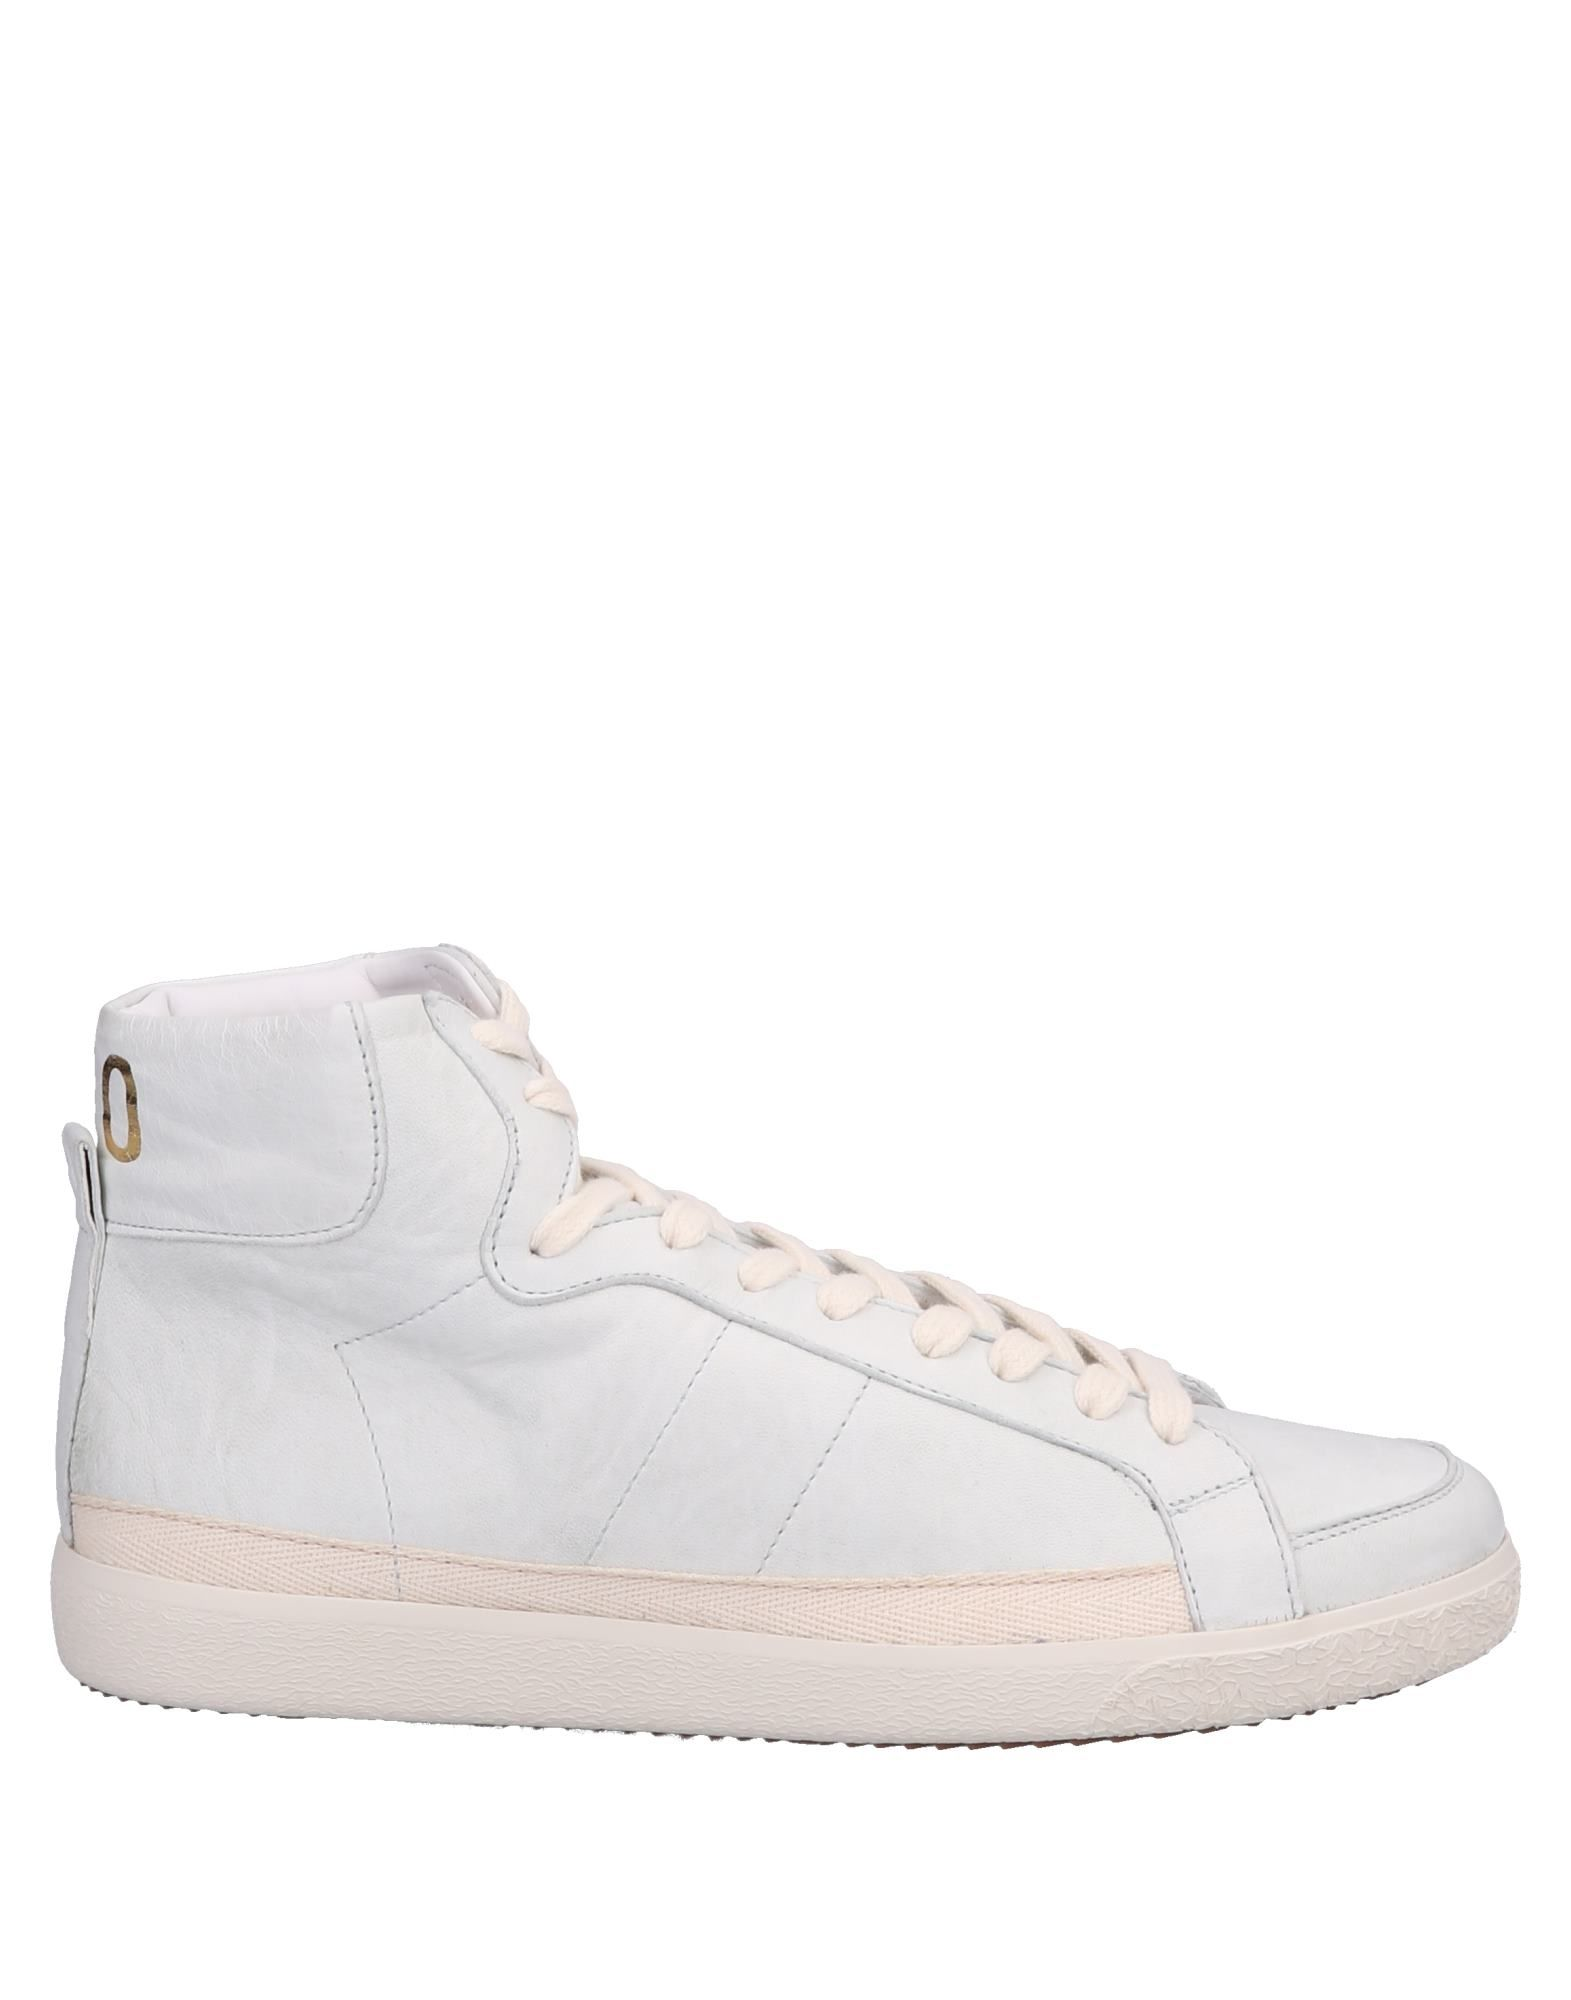 Pantofola Pantofola D'oro Sneakers - Men Pantofola Pantofola D'oro Sneakers online on  Australia - 11571323FN b6e57c